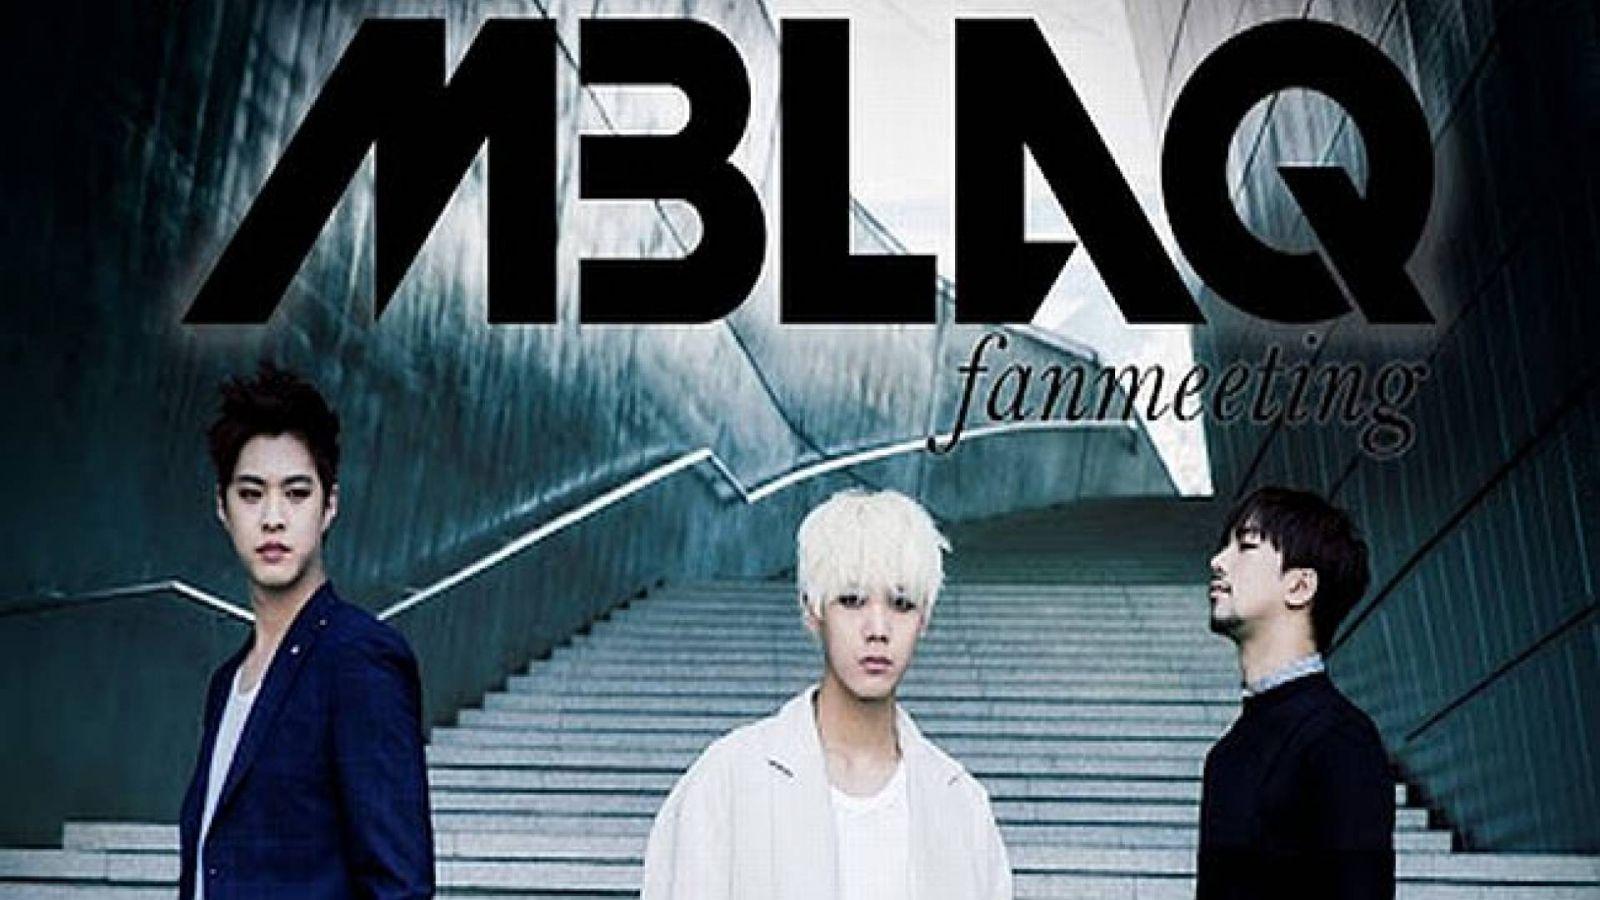 Fan meeting do MBLAQ cancelado © MBLAQ, HIghway Star